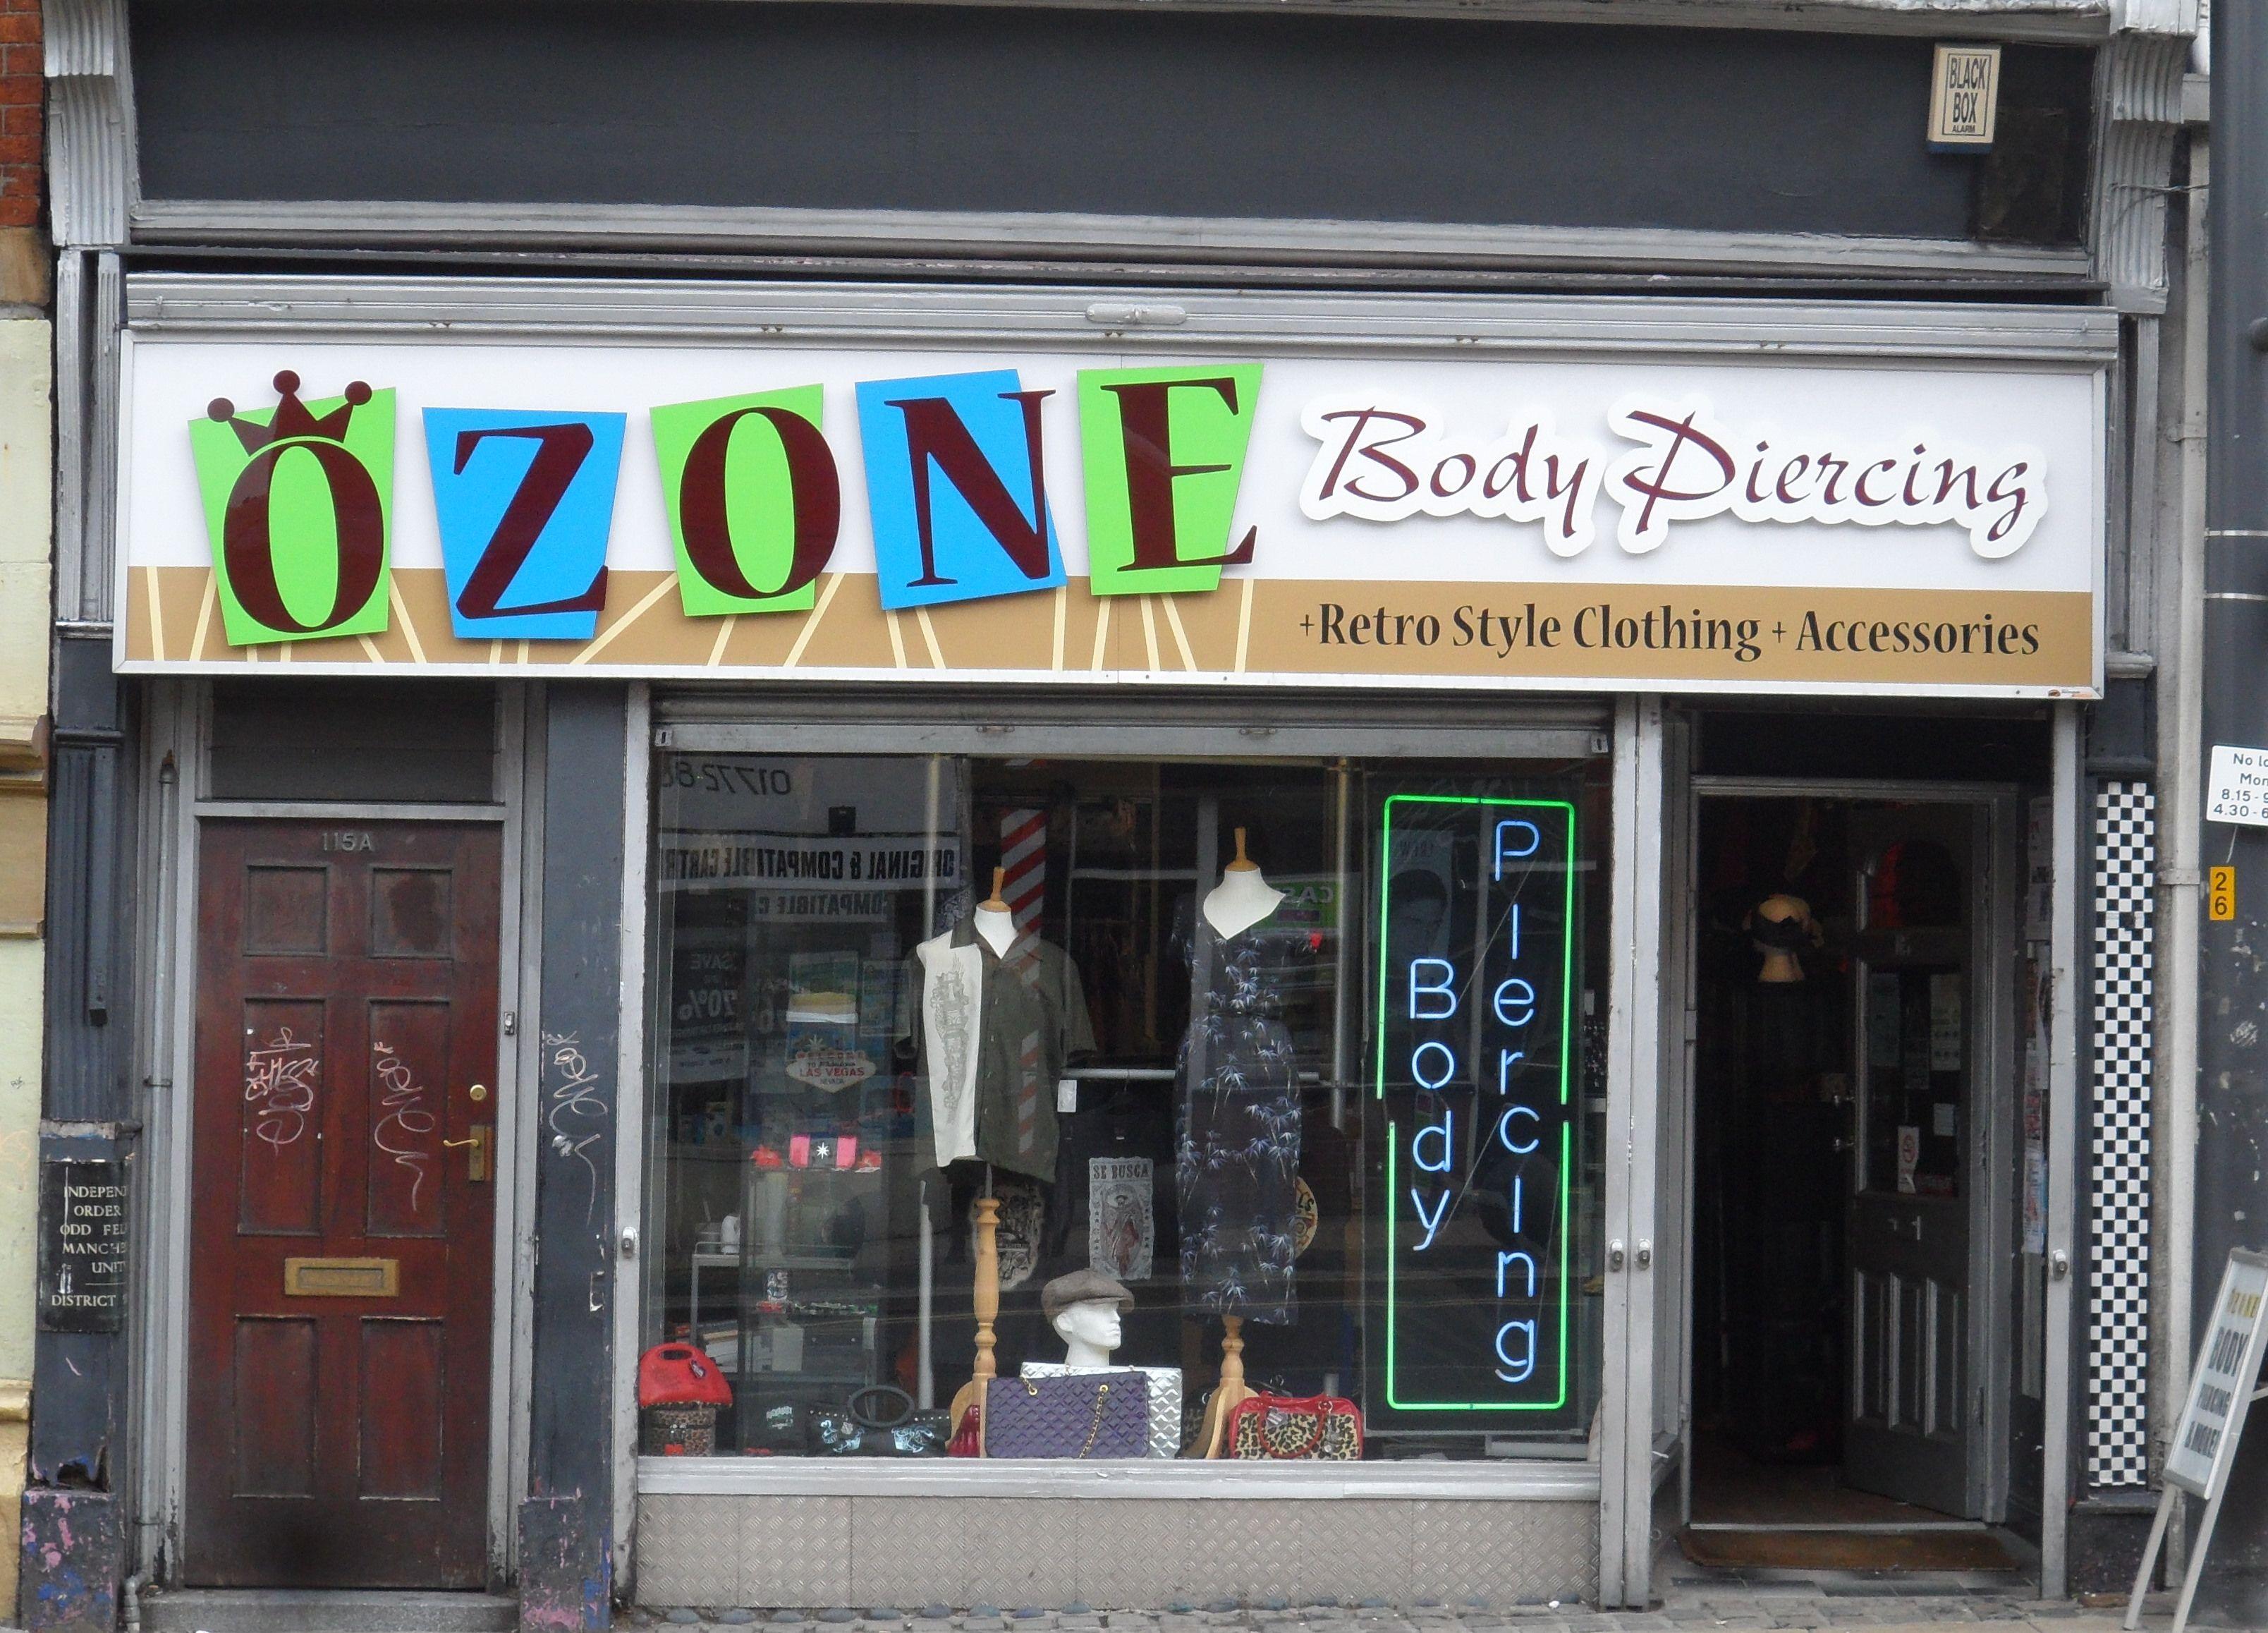 Ozone Body Piercing | Preston | Piercings, Body piercing, Broadway shows